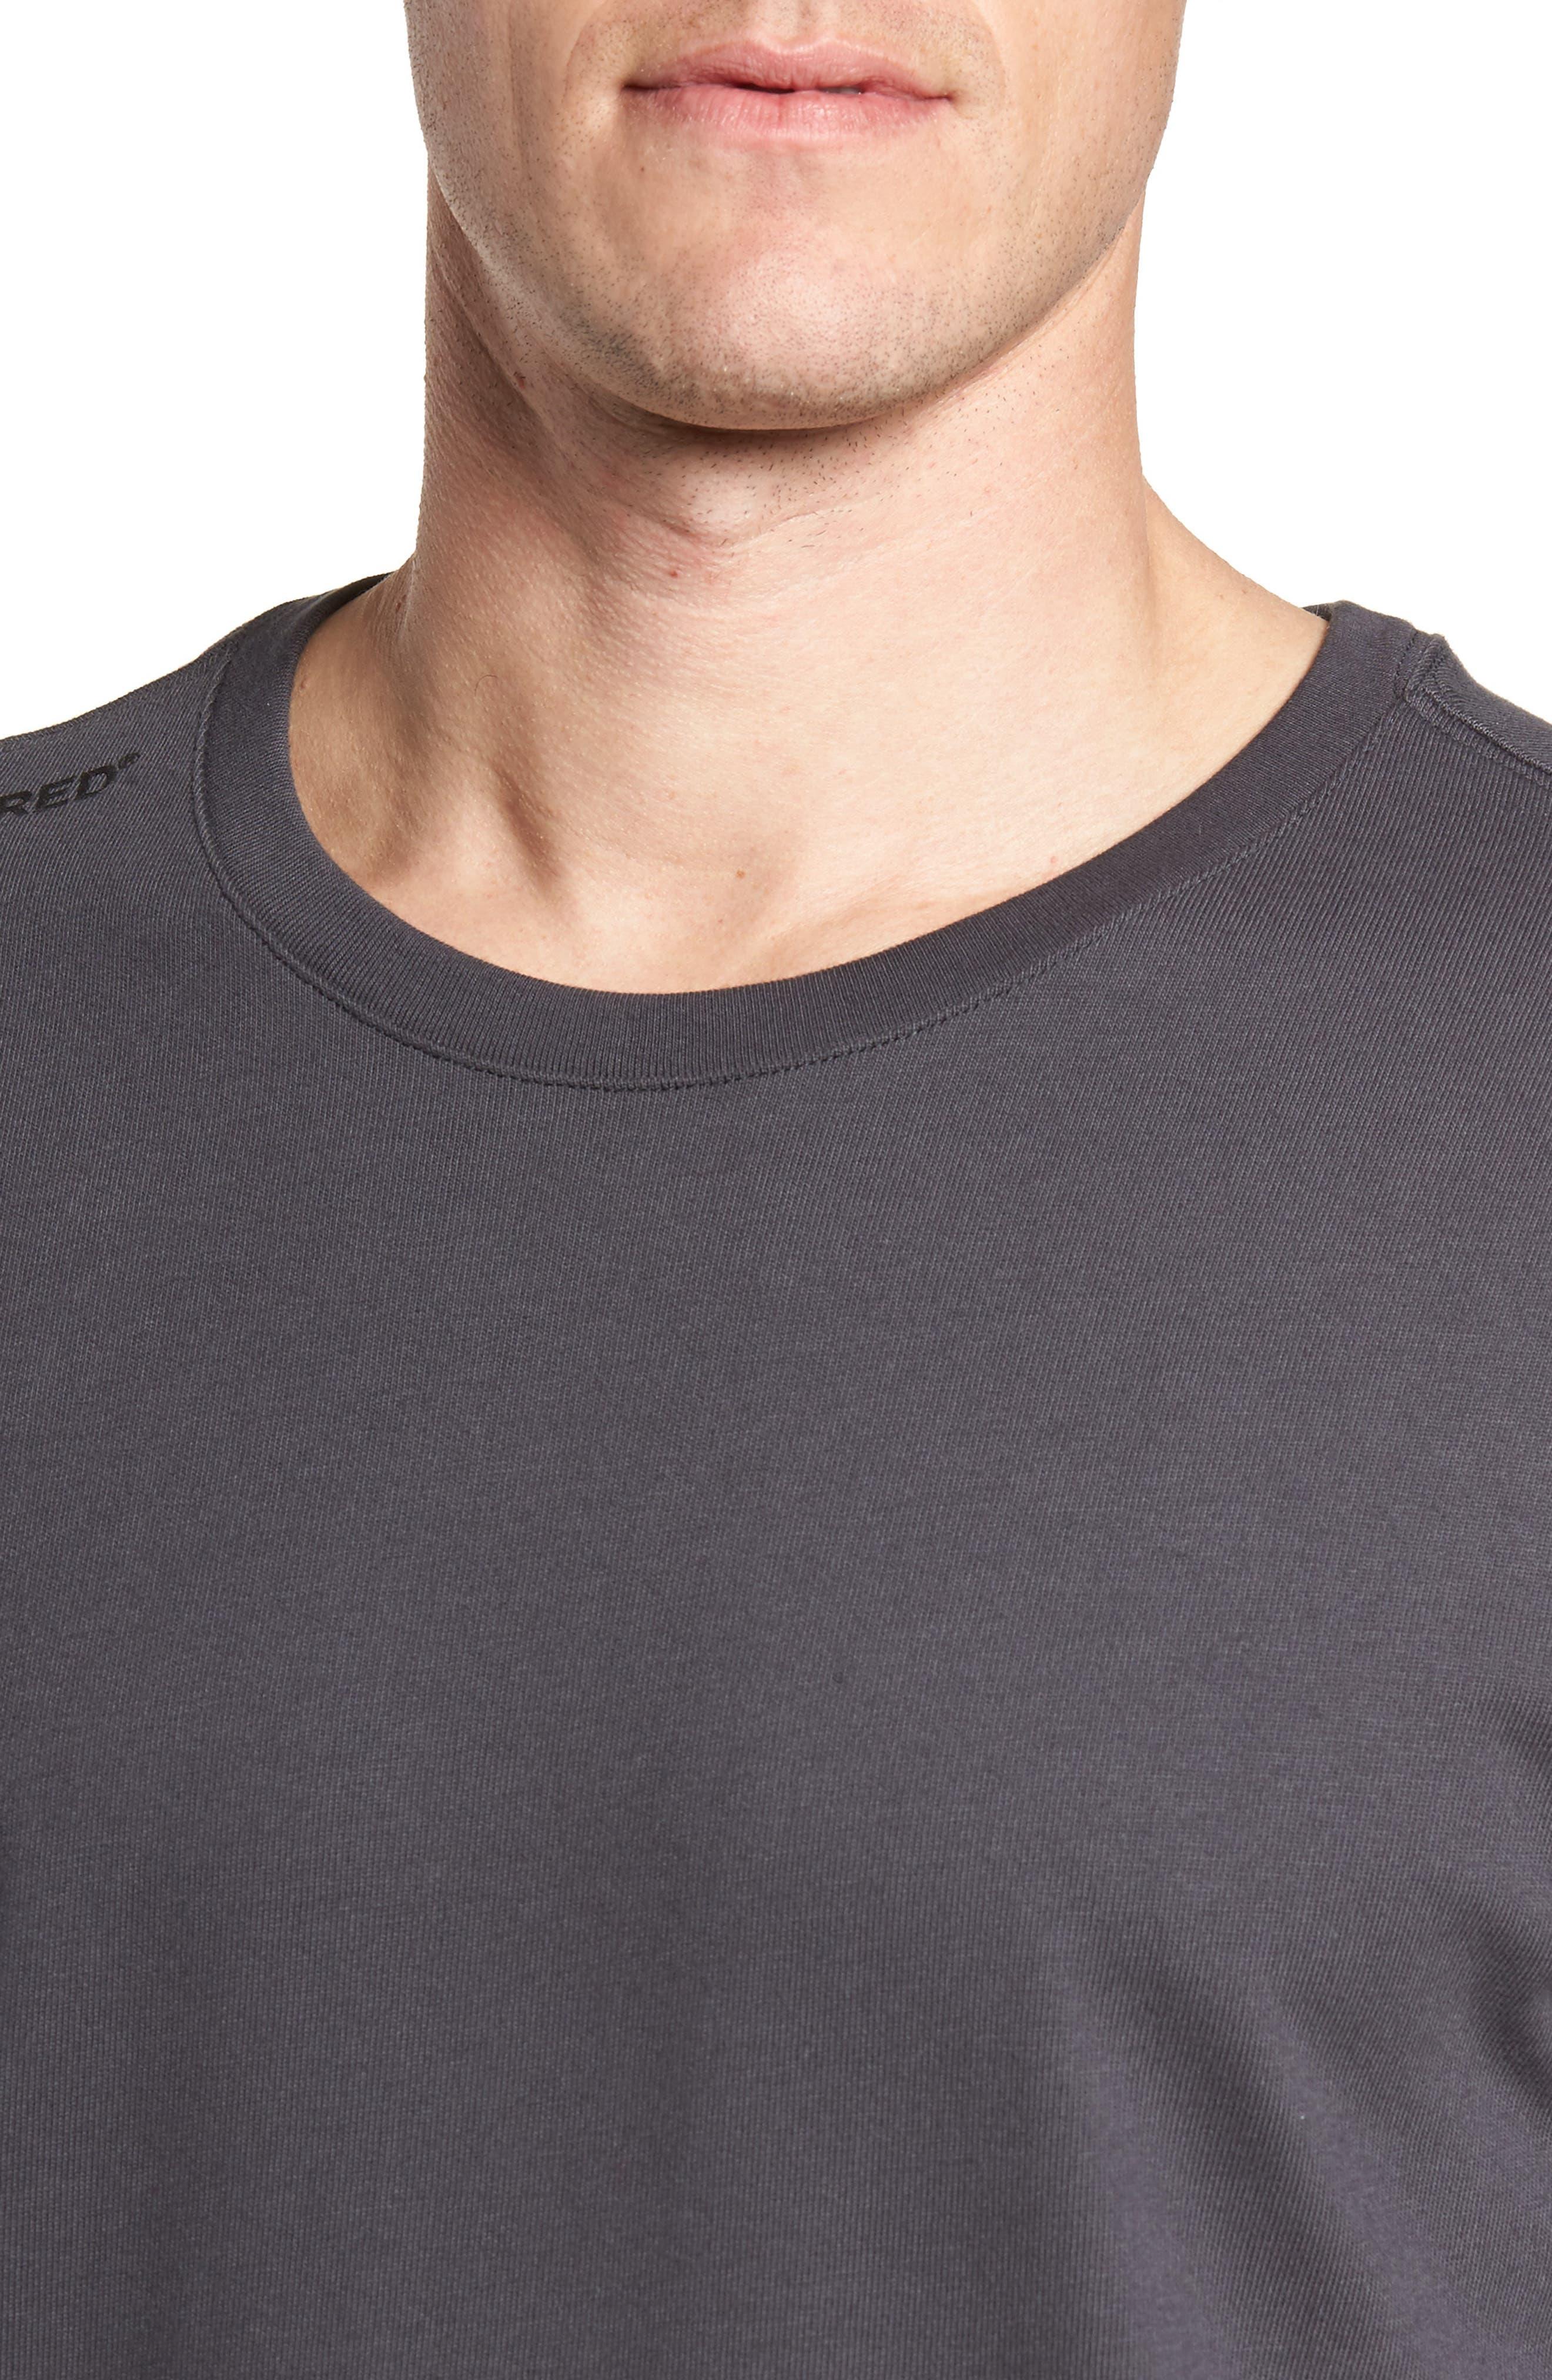 Sportswear 23 Engineered T-Shirt,                             Alternate thumbnail 4, color,                             060